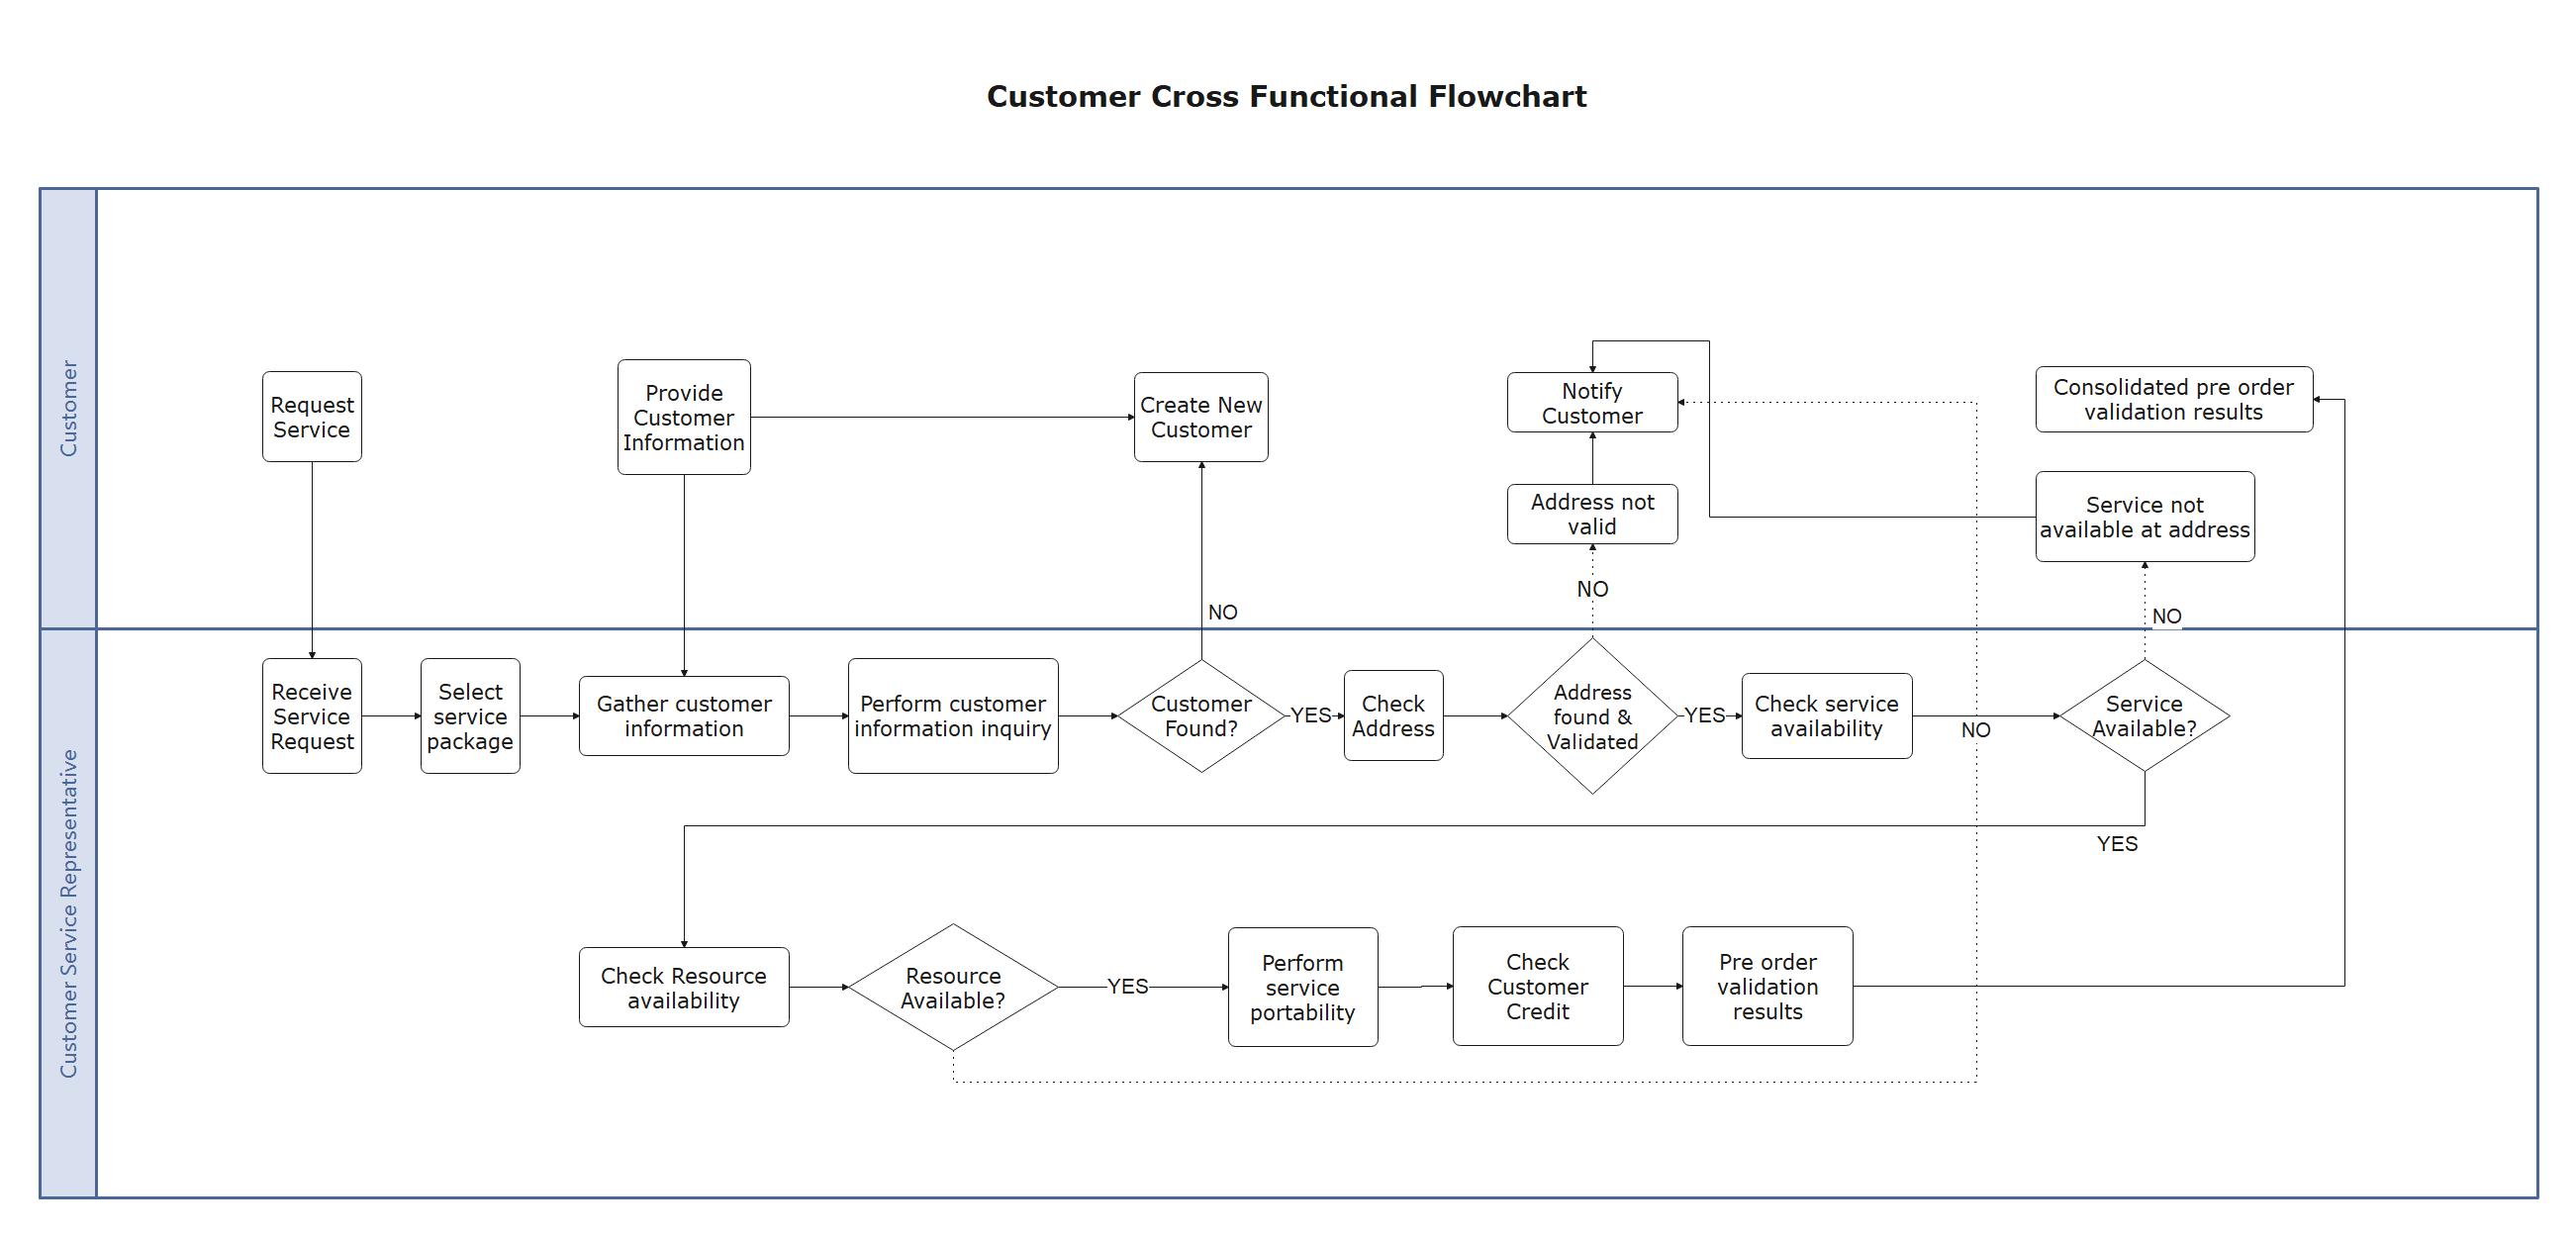 Customer Cross-Functional Flowchart